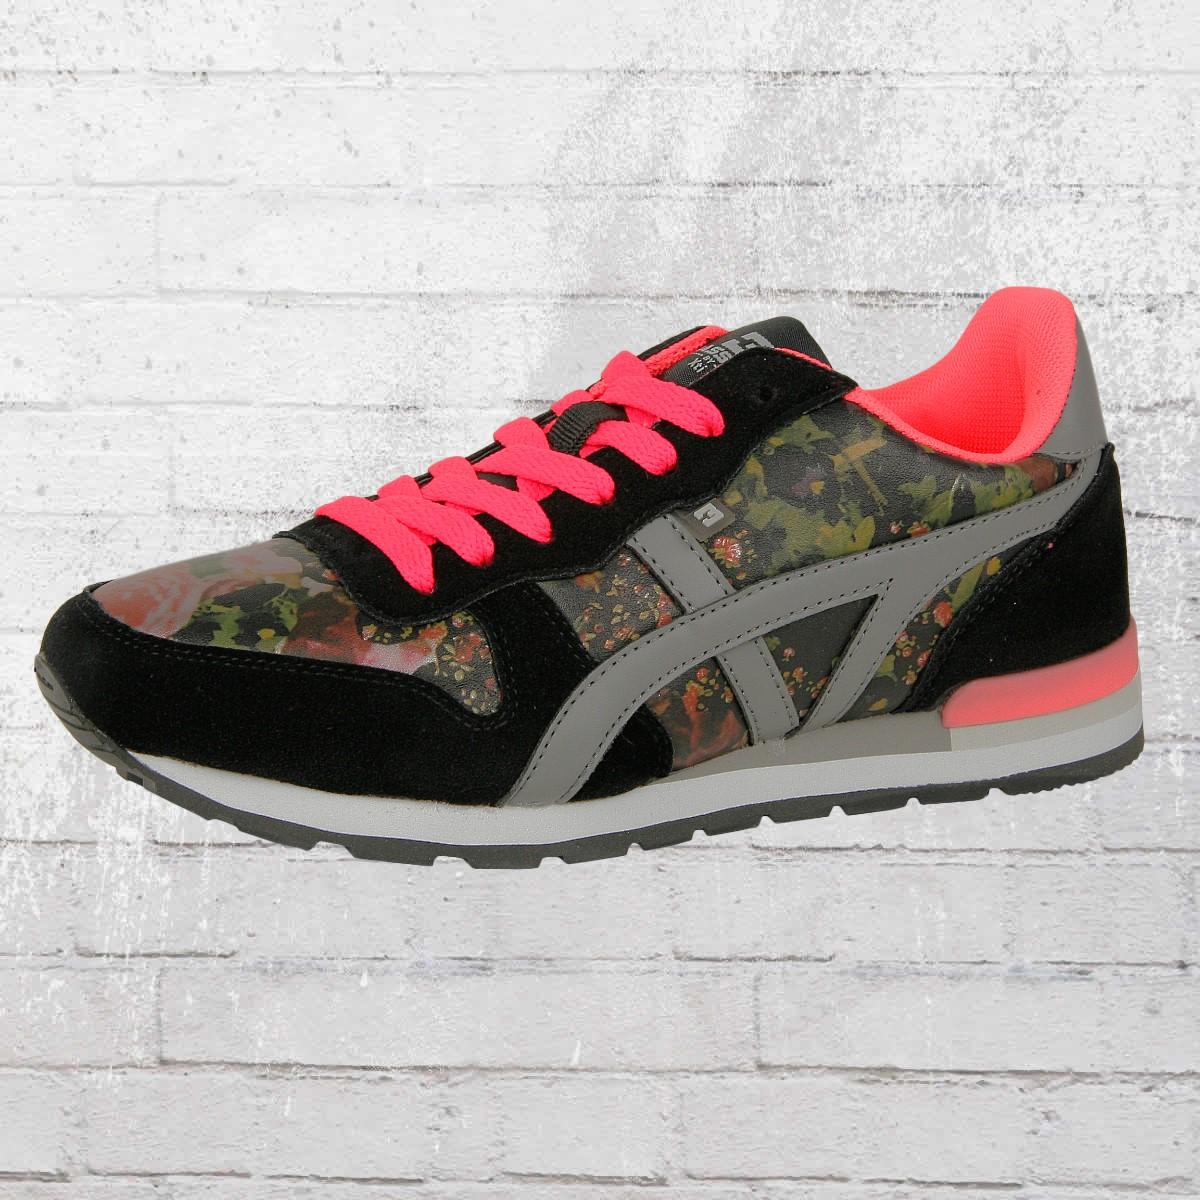 BASSED by Xti Frauen Schuhe Zapato Sra Flower Sneaker schwarz Damen Ladies Shoes